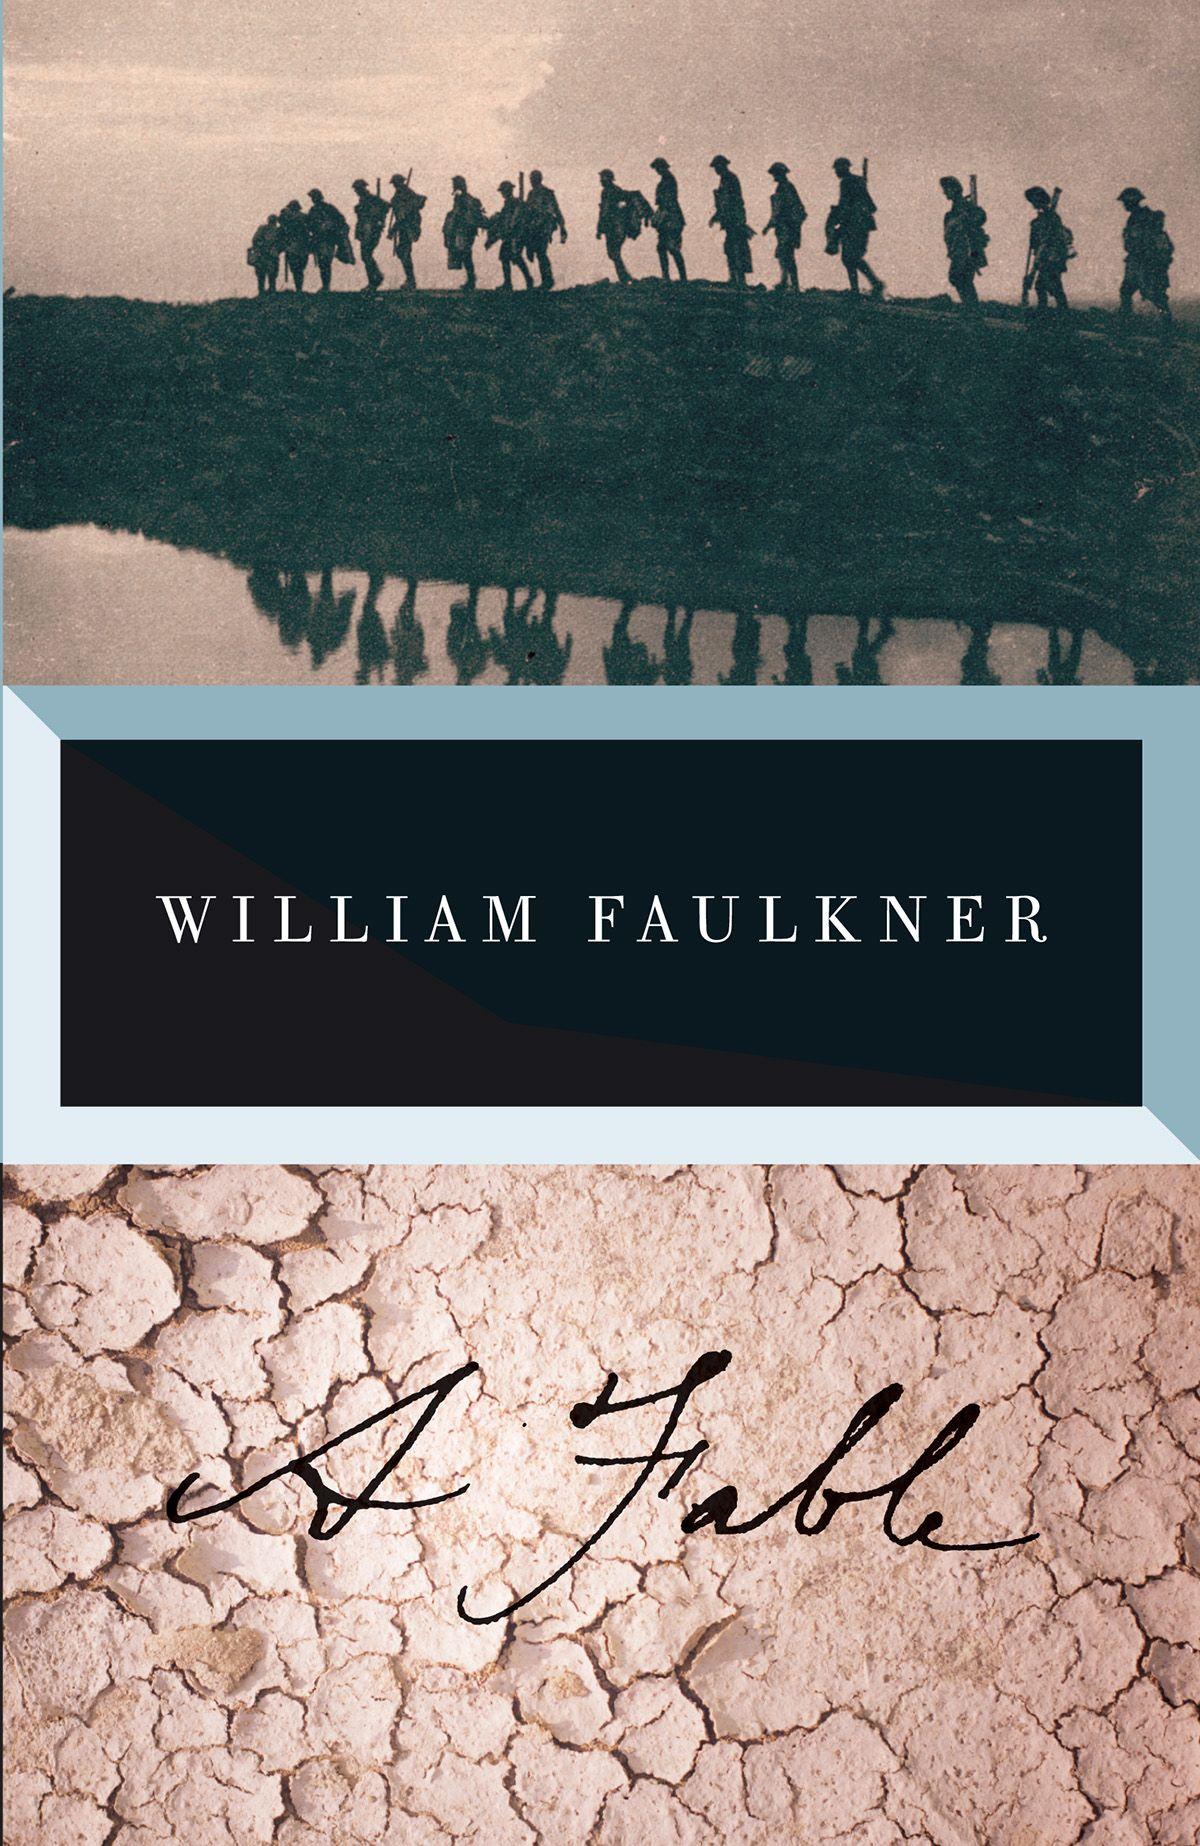 06 A Fable, William Faulkner